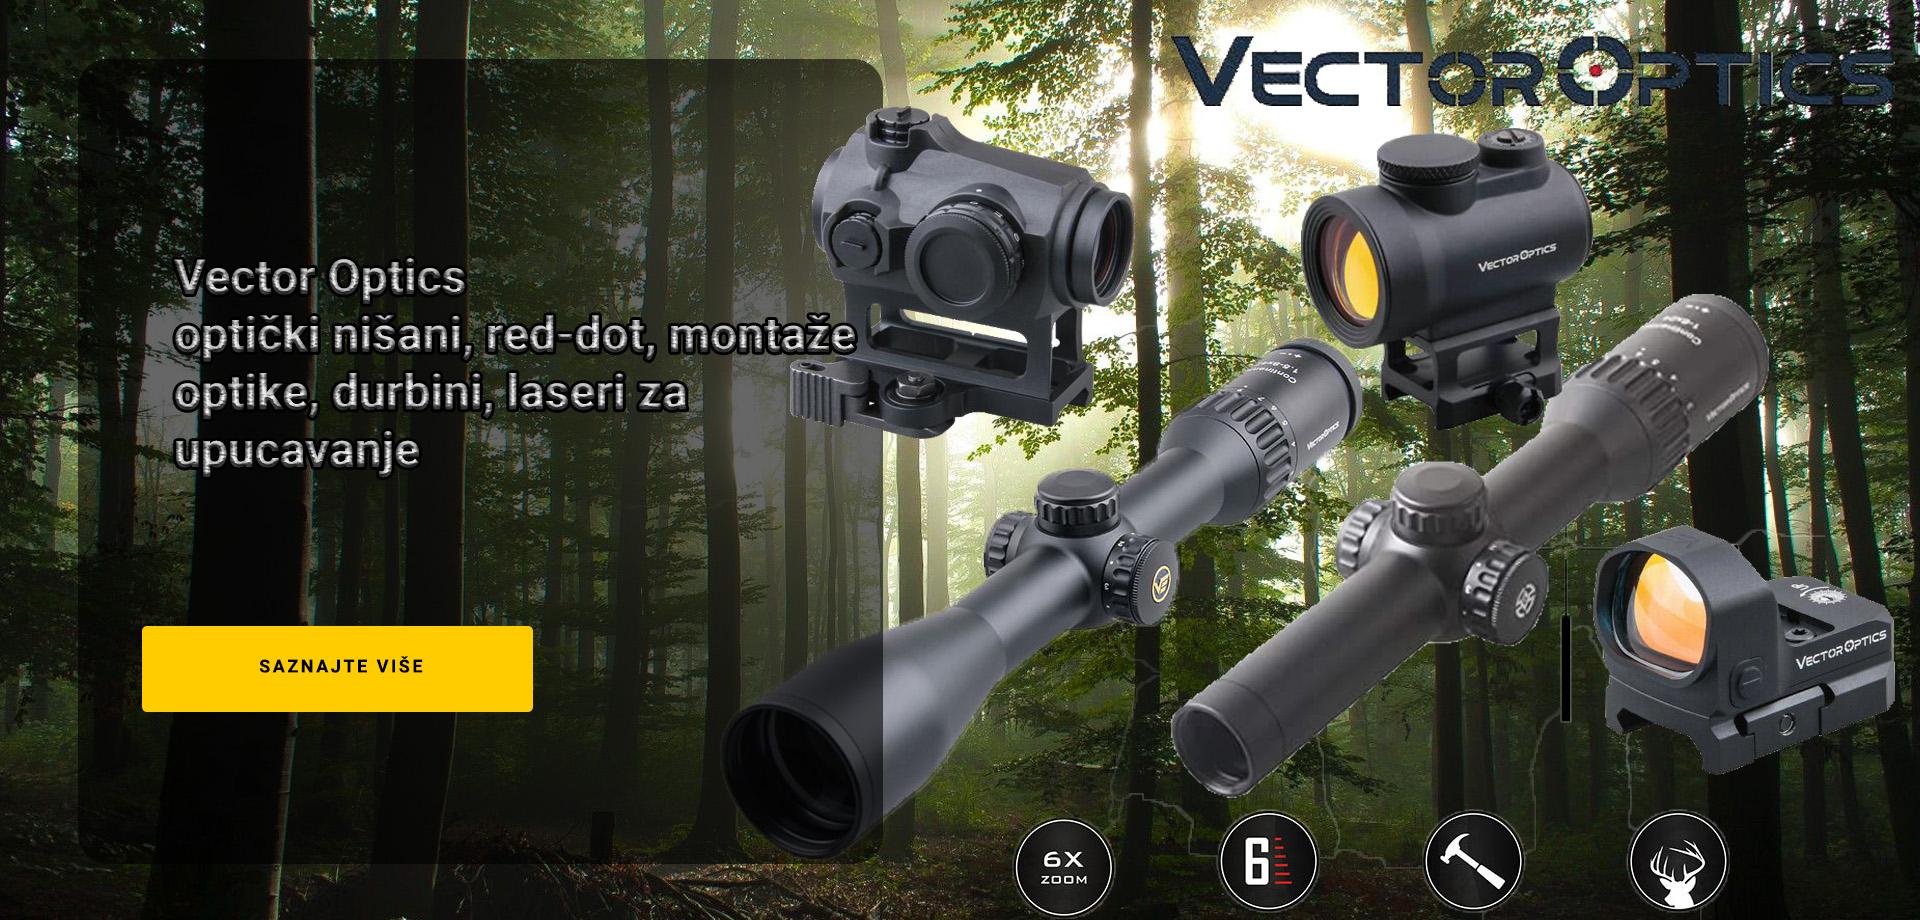 Vectoroptic